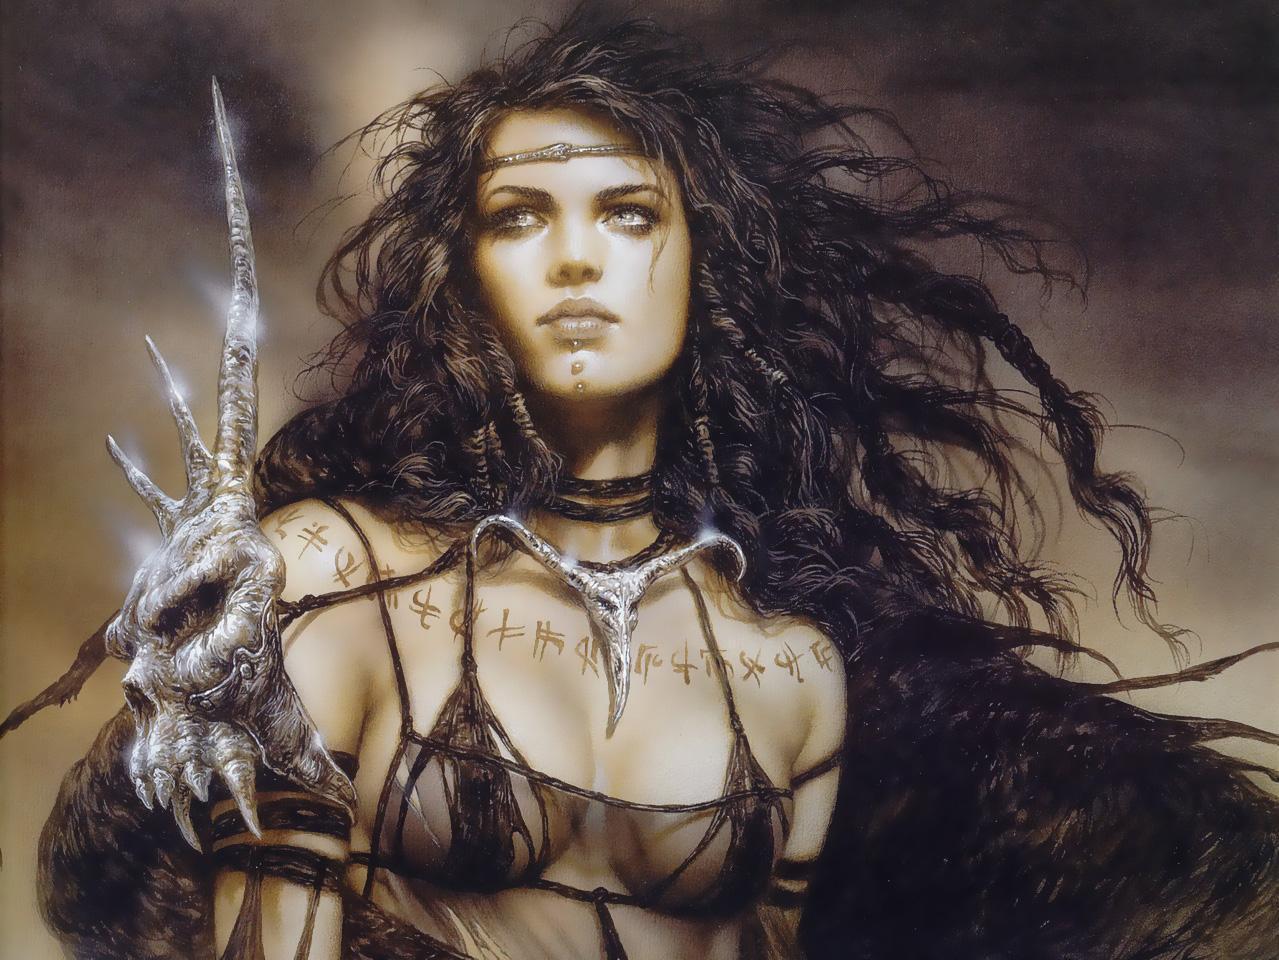 1279x960px warrior woman wallpaper - wallpapersafari